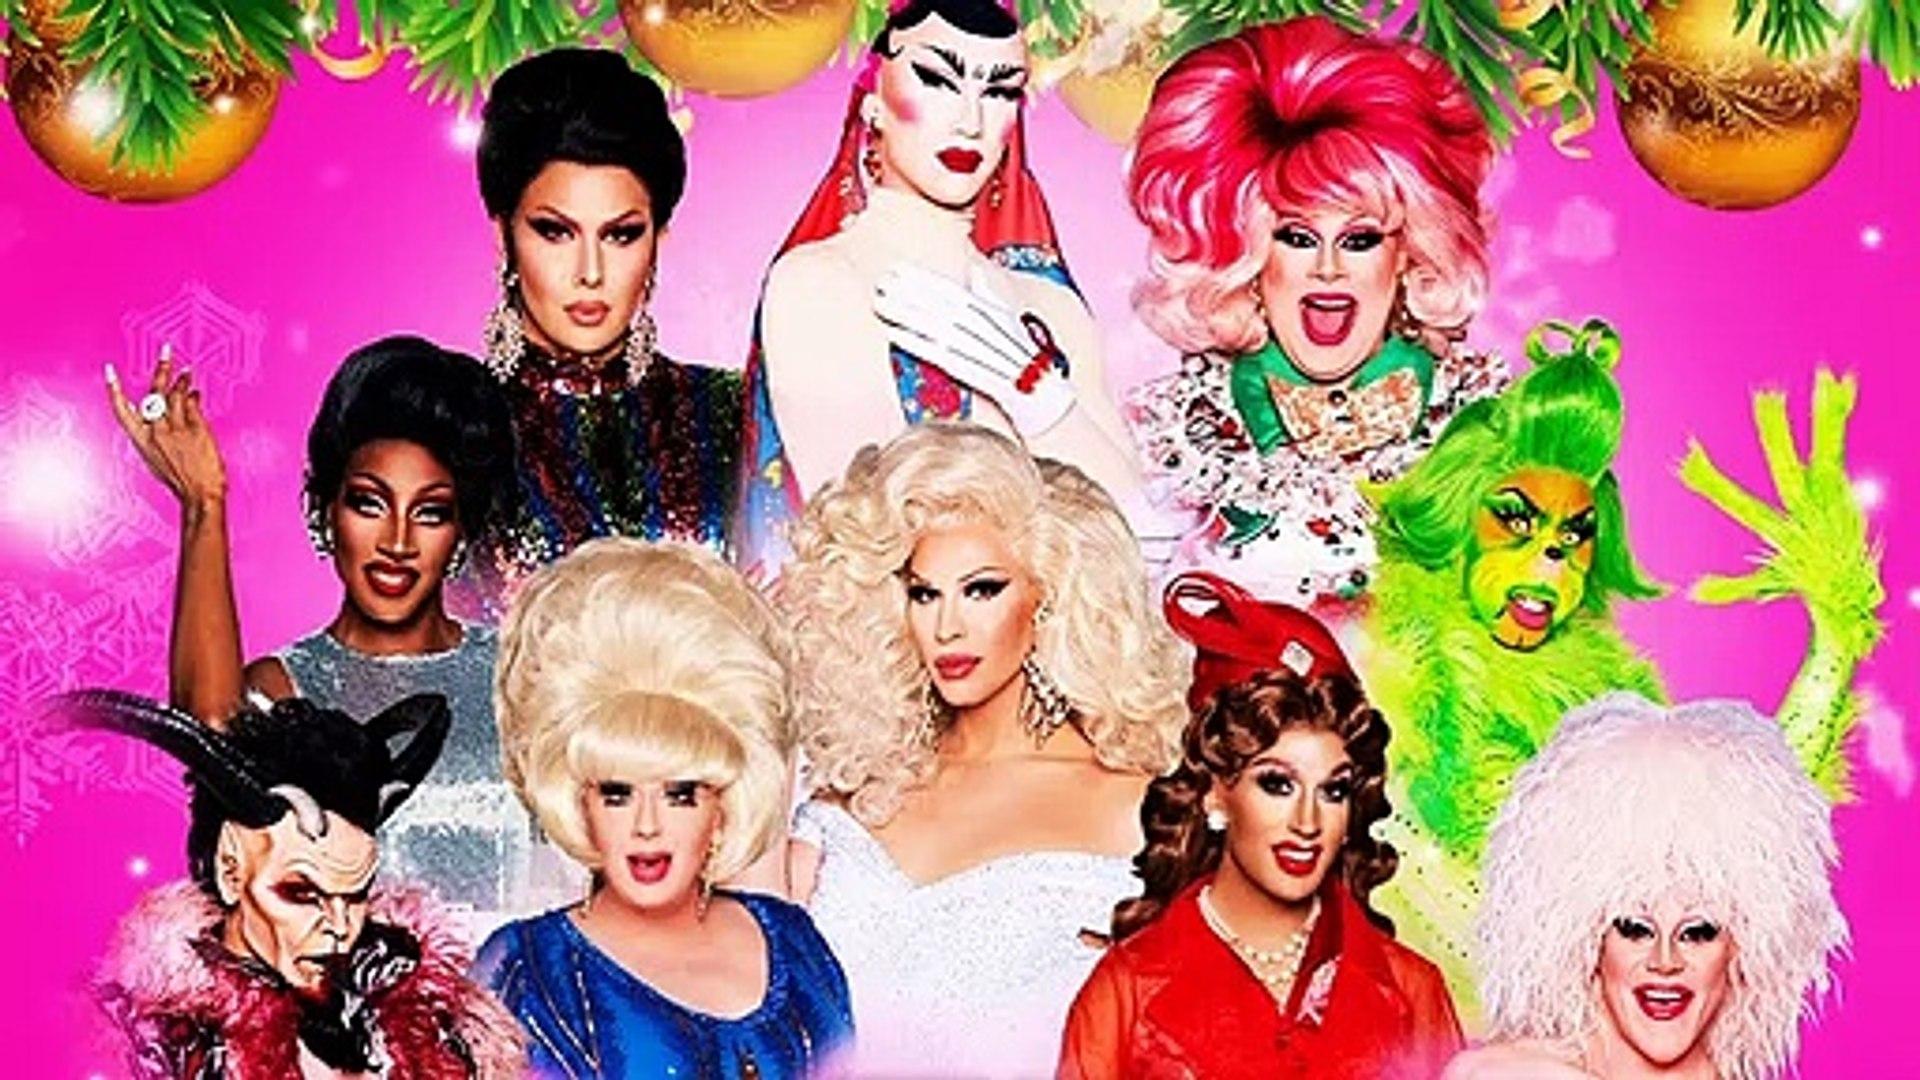 Drag Queen Christmas Part 2 (2020)